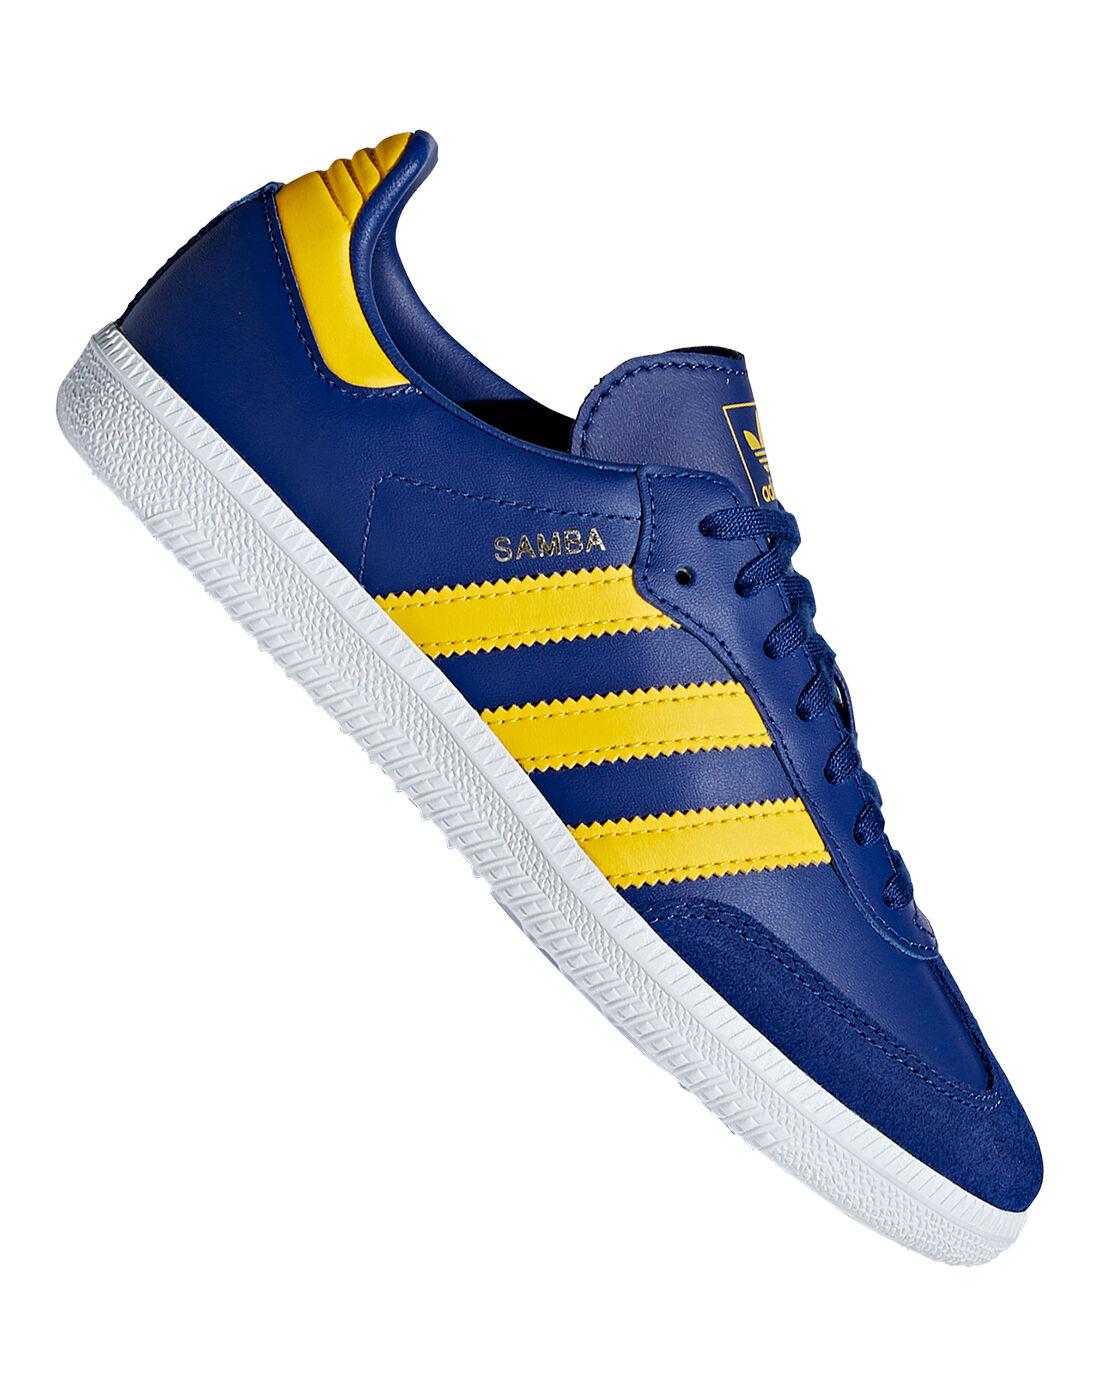 blue and yellow adidas samba trainers